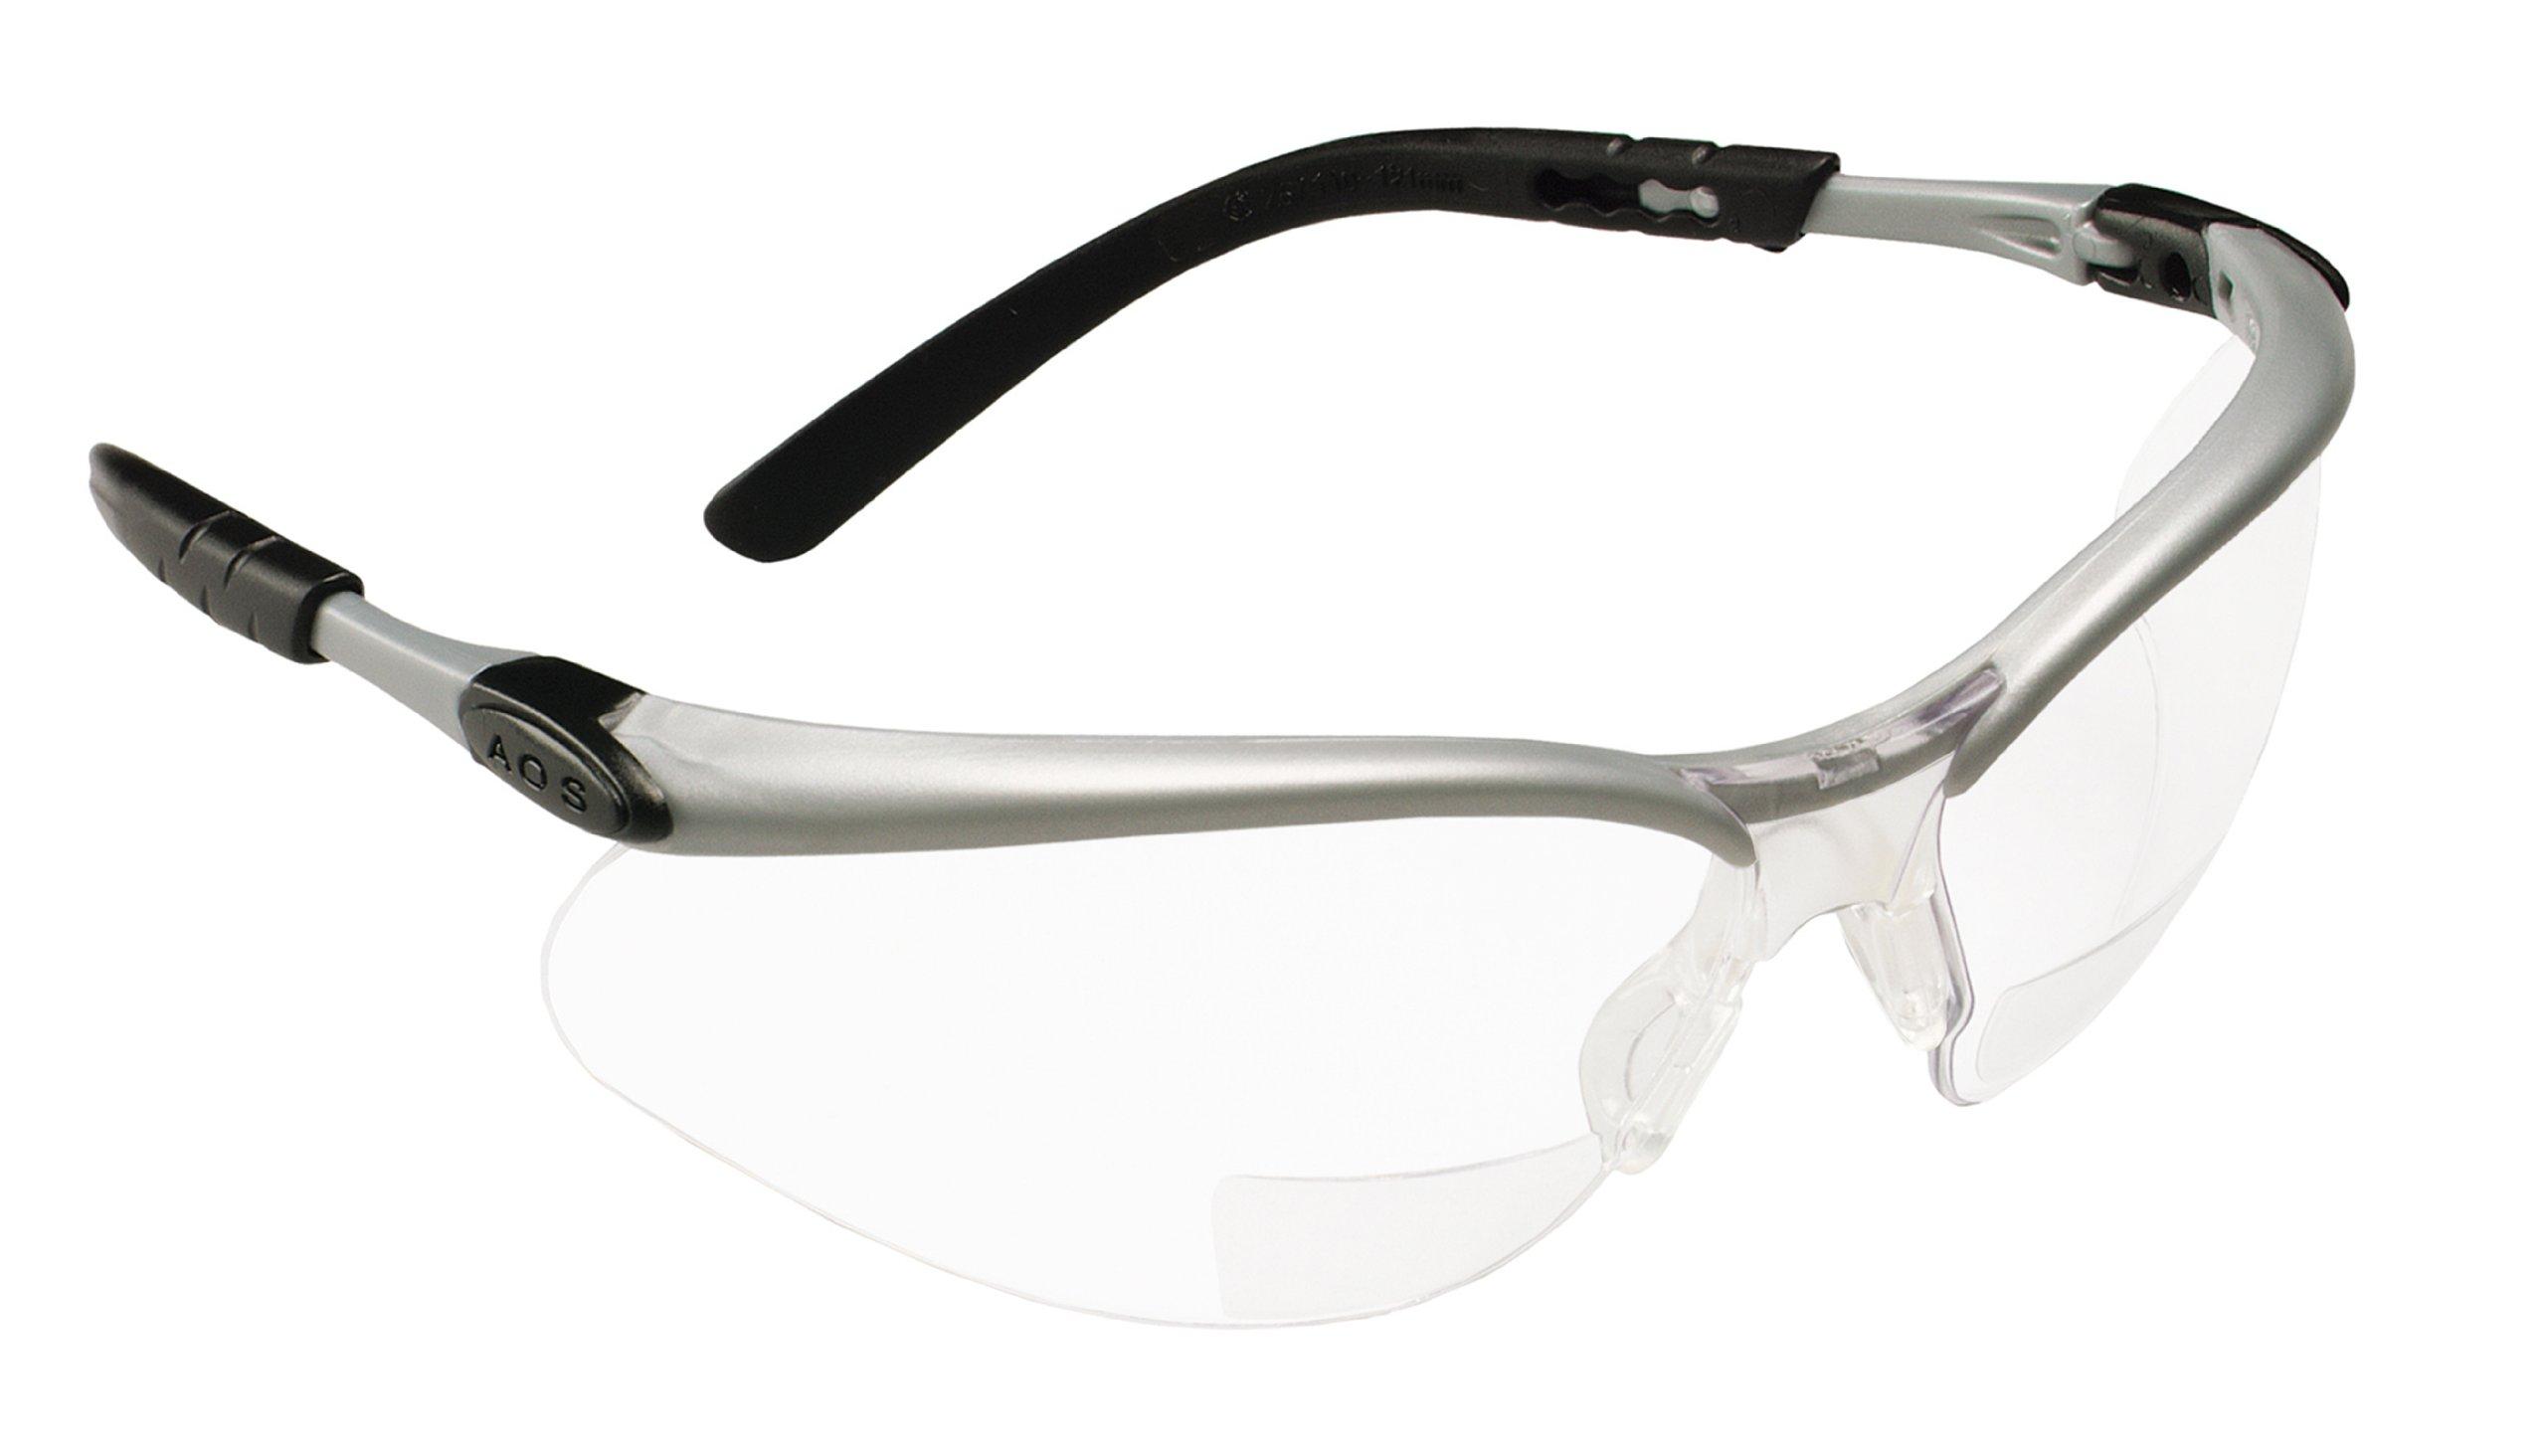 Amazon.com: Bifocal Reading Sunglasses with Polycarbonate